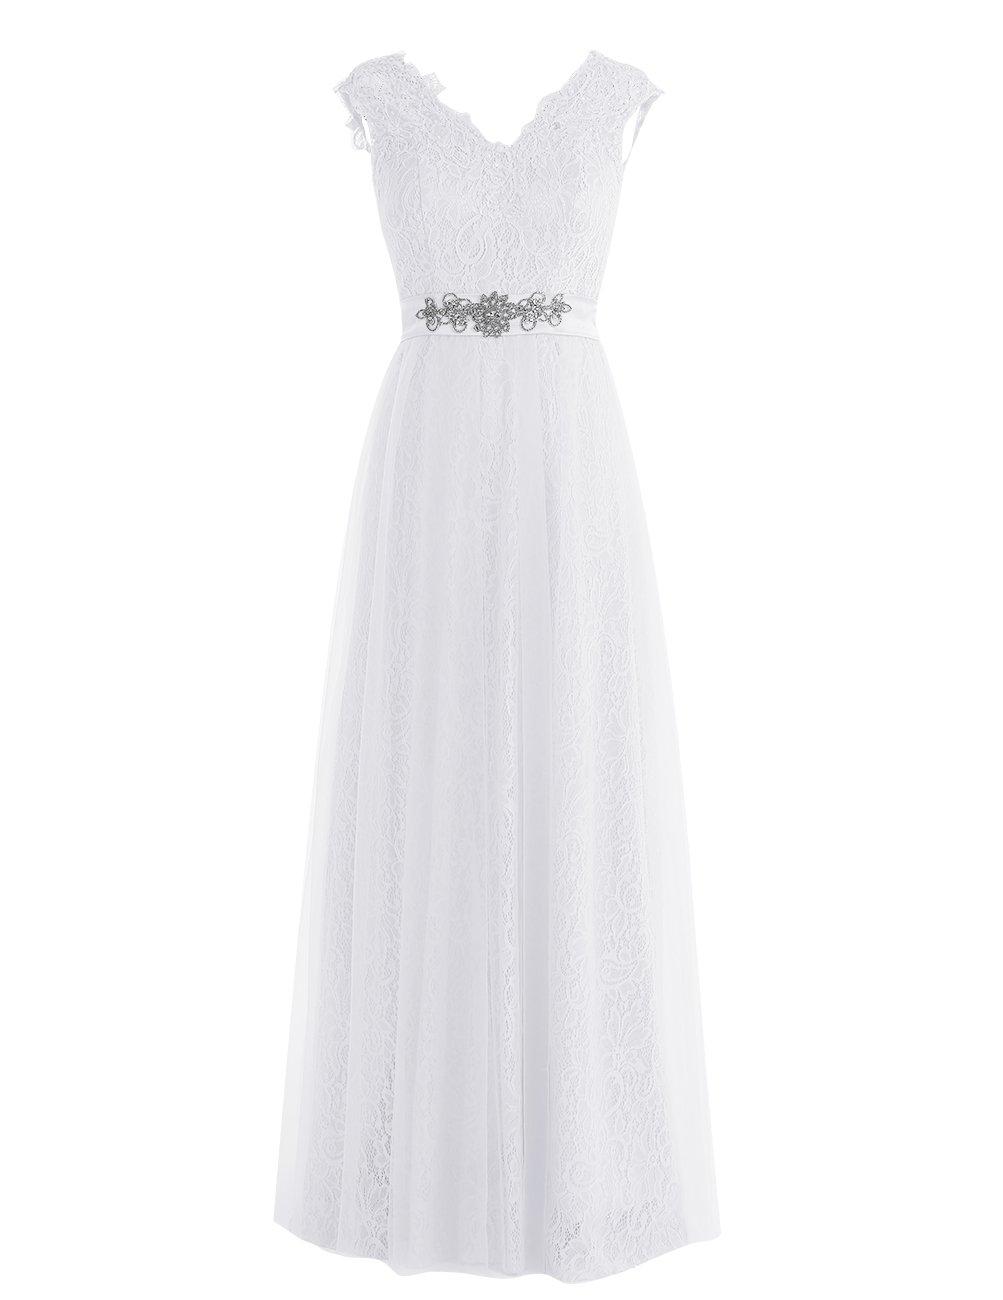 Dresstell レディーズ ロング丈 披露宴ドレス 結婚式ドレス 総レースのお呼ばれ フォーマルドレス キラキラビジュー付き ビスチェタイプ 編み上げの花嫁ワンピース 二次会ドレス ステージドレス B01M0TK7S1 JP19W|ホワイト ホワイト JP19W